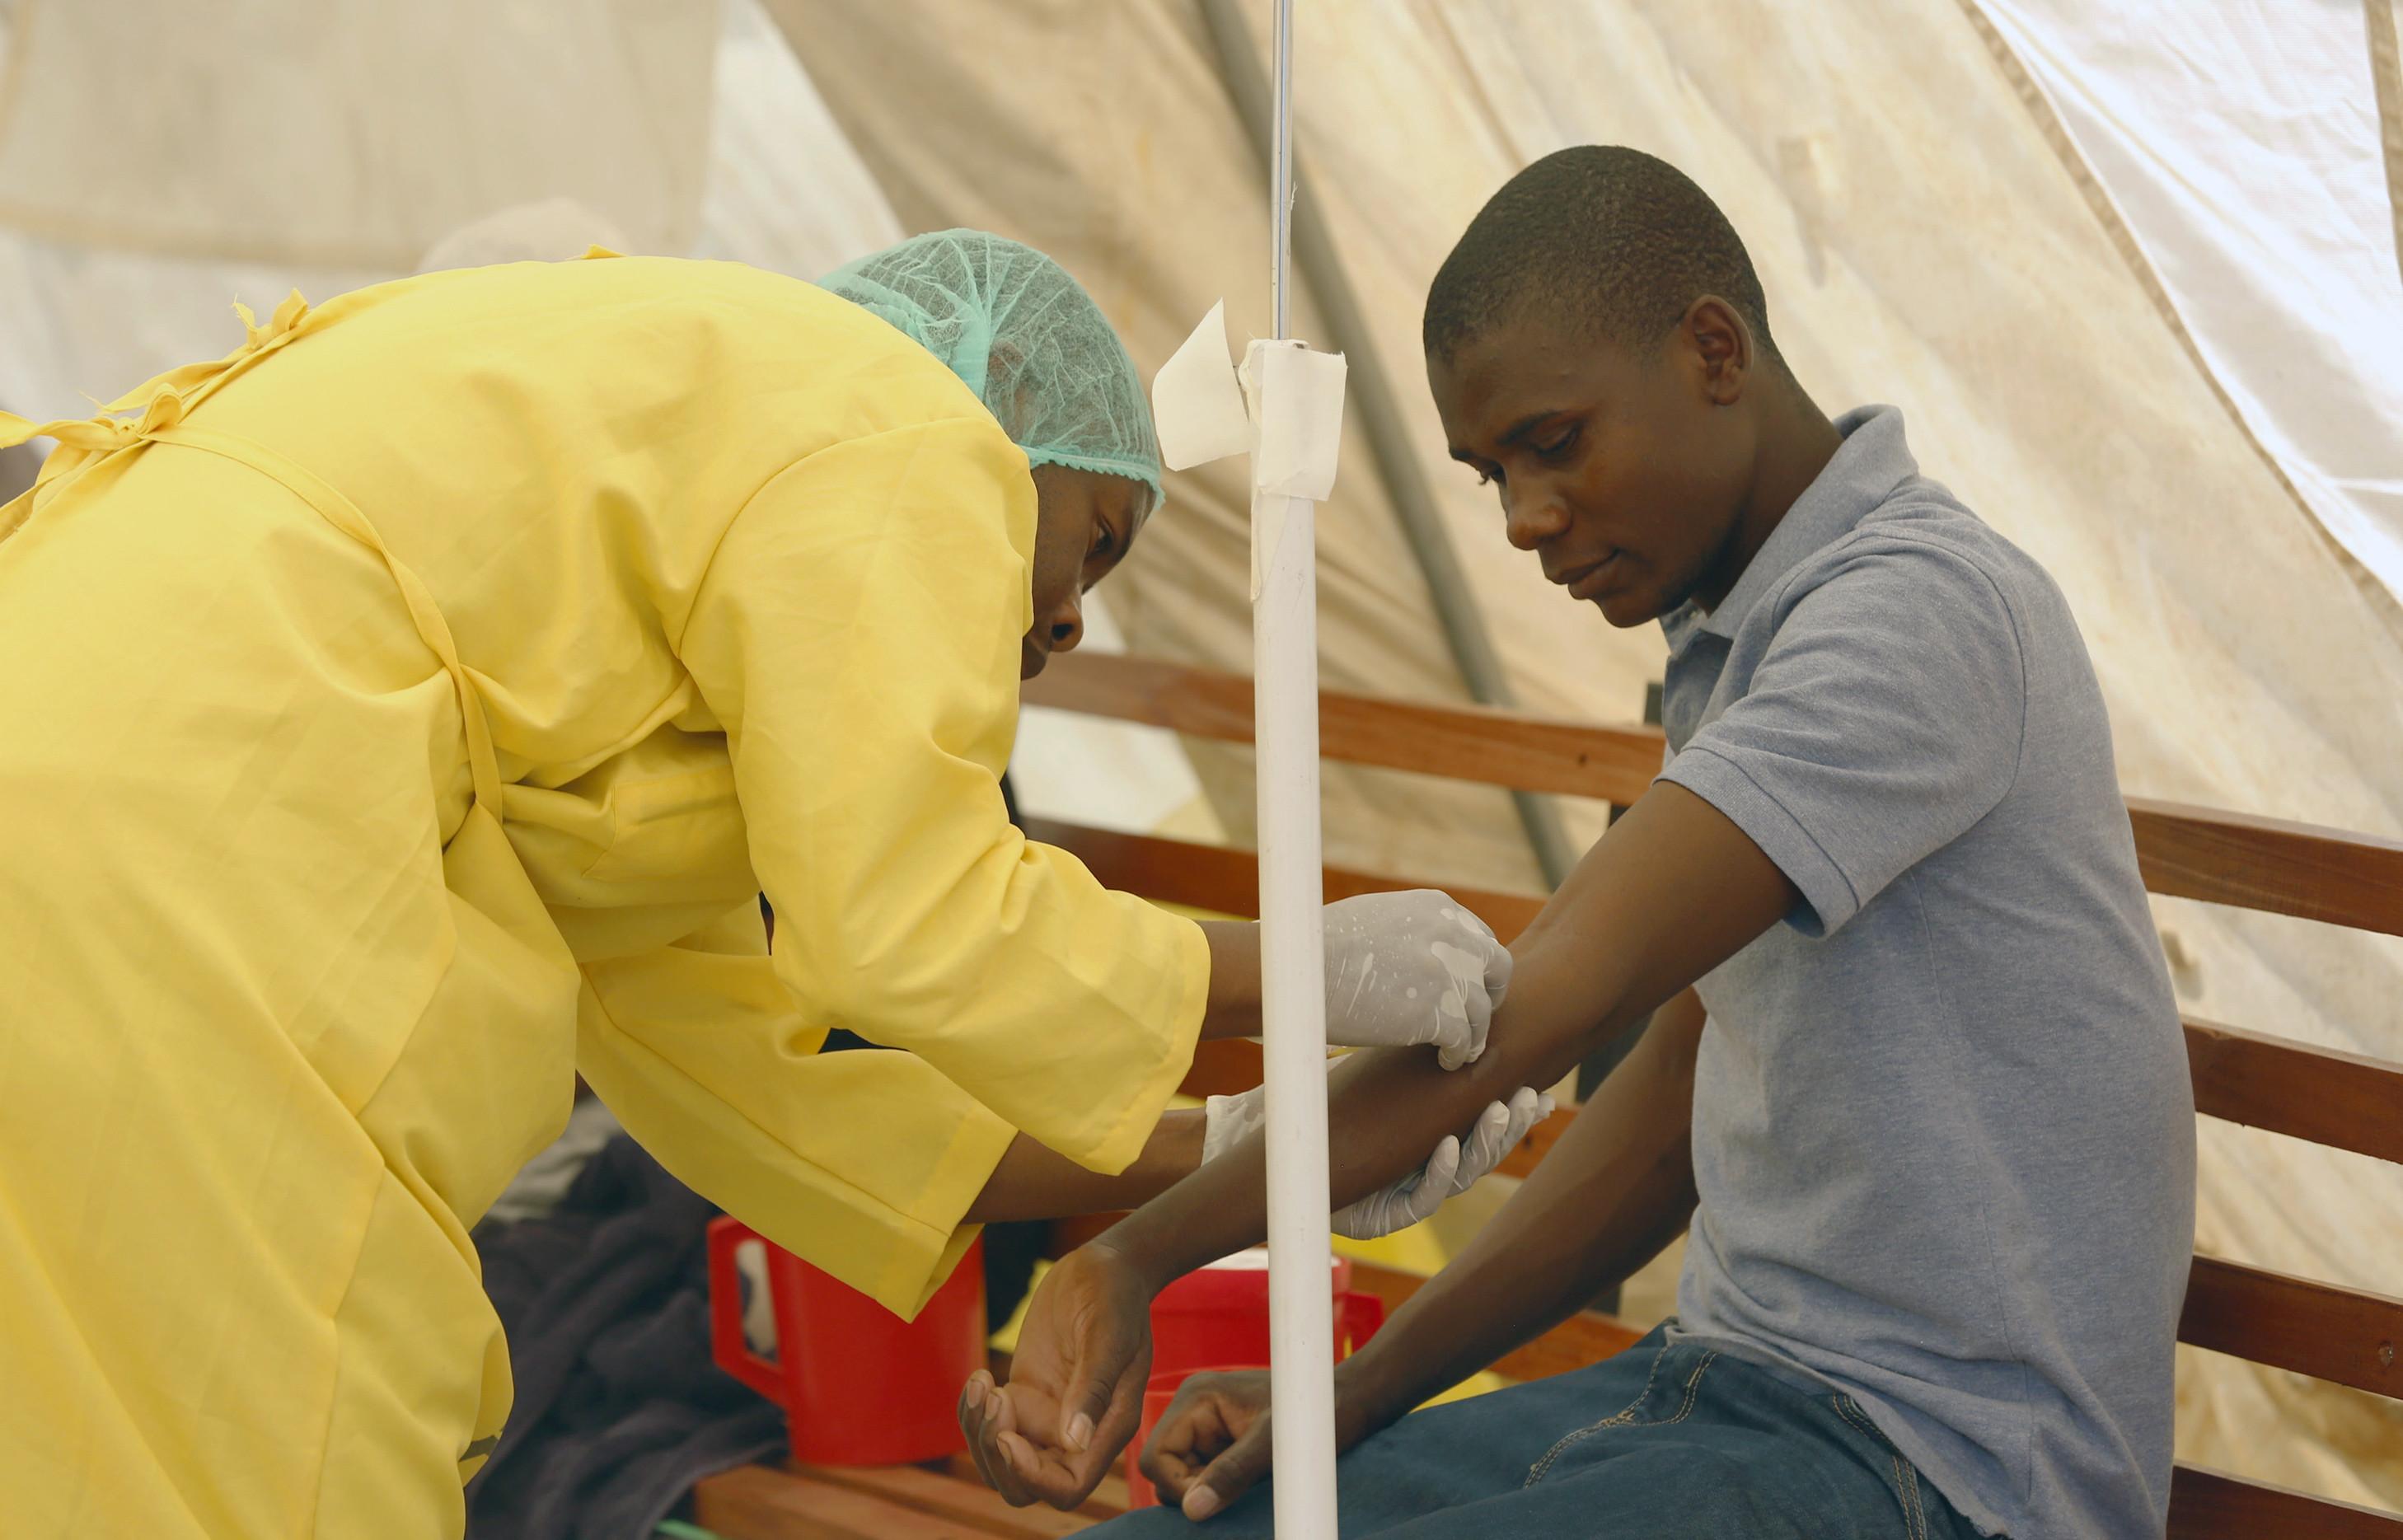 Cólera faz cinco mortos perto da fronteira entre Zimbabué e Moçambique